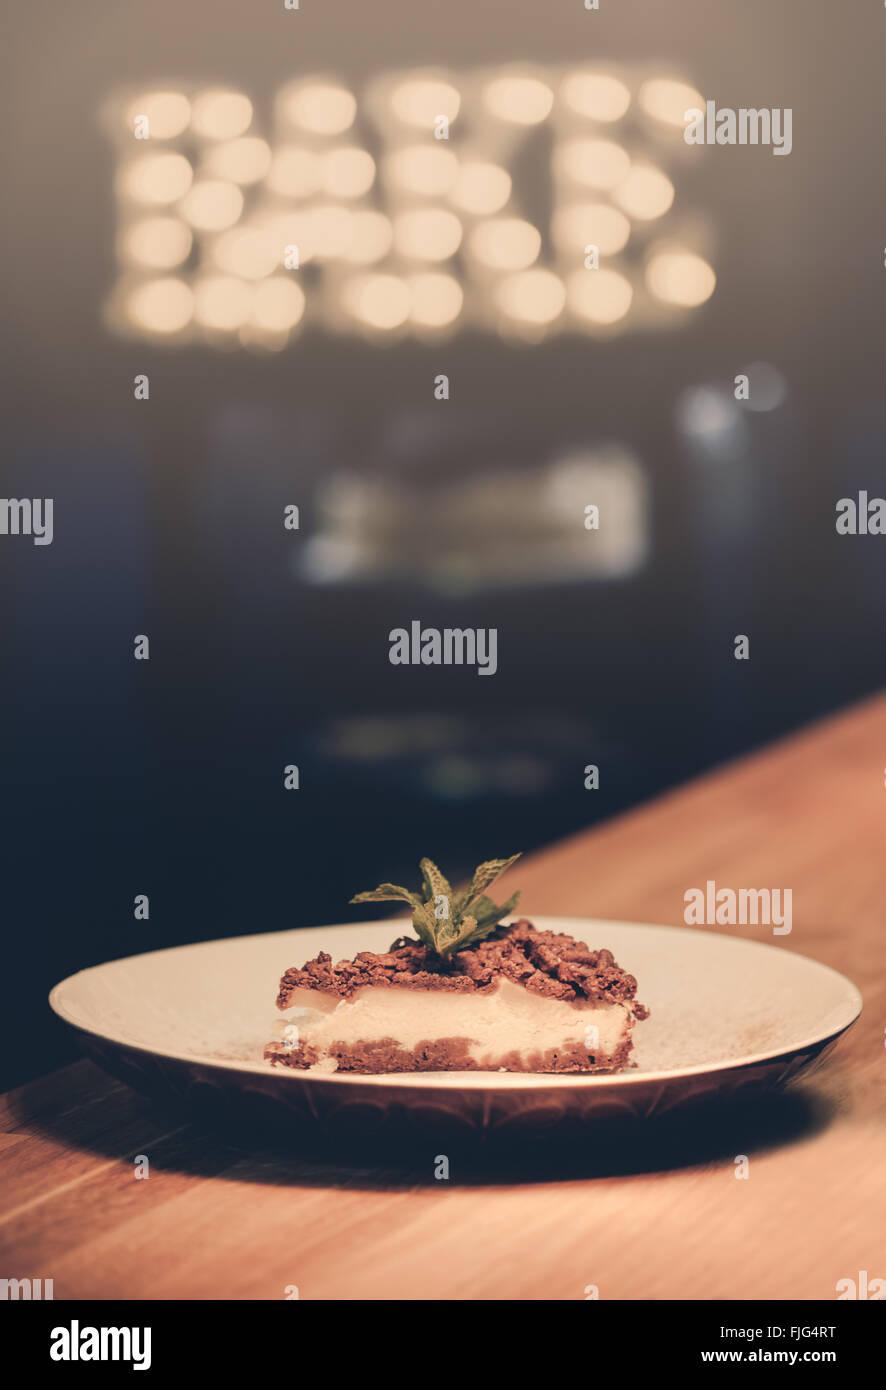 Food Cake Bake Cheesecake Plate Sweet - Stock Image